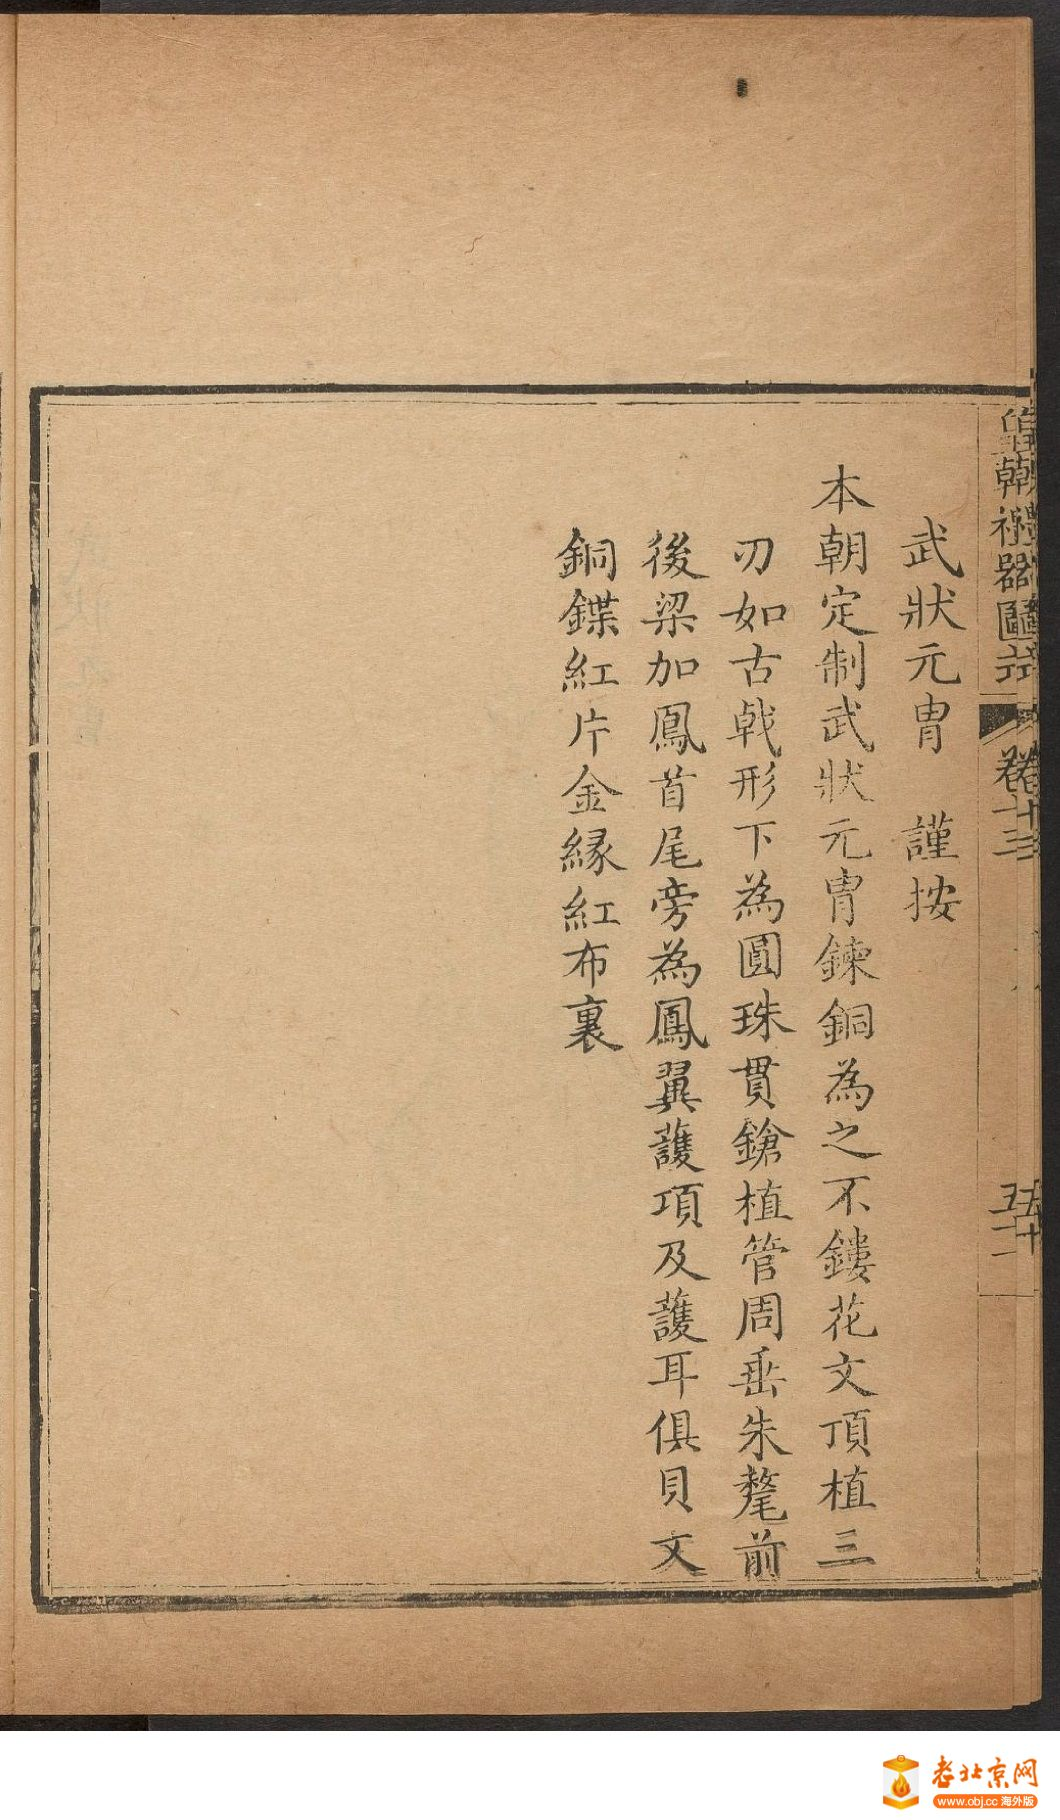 6_page2_image1b.jpg